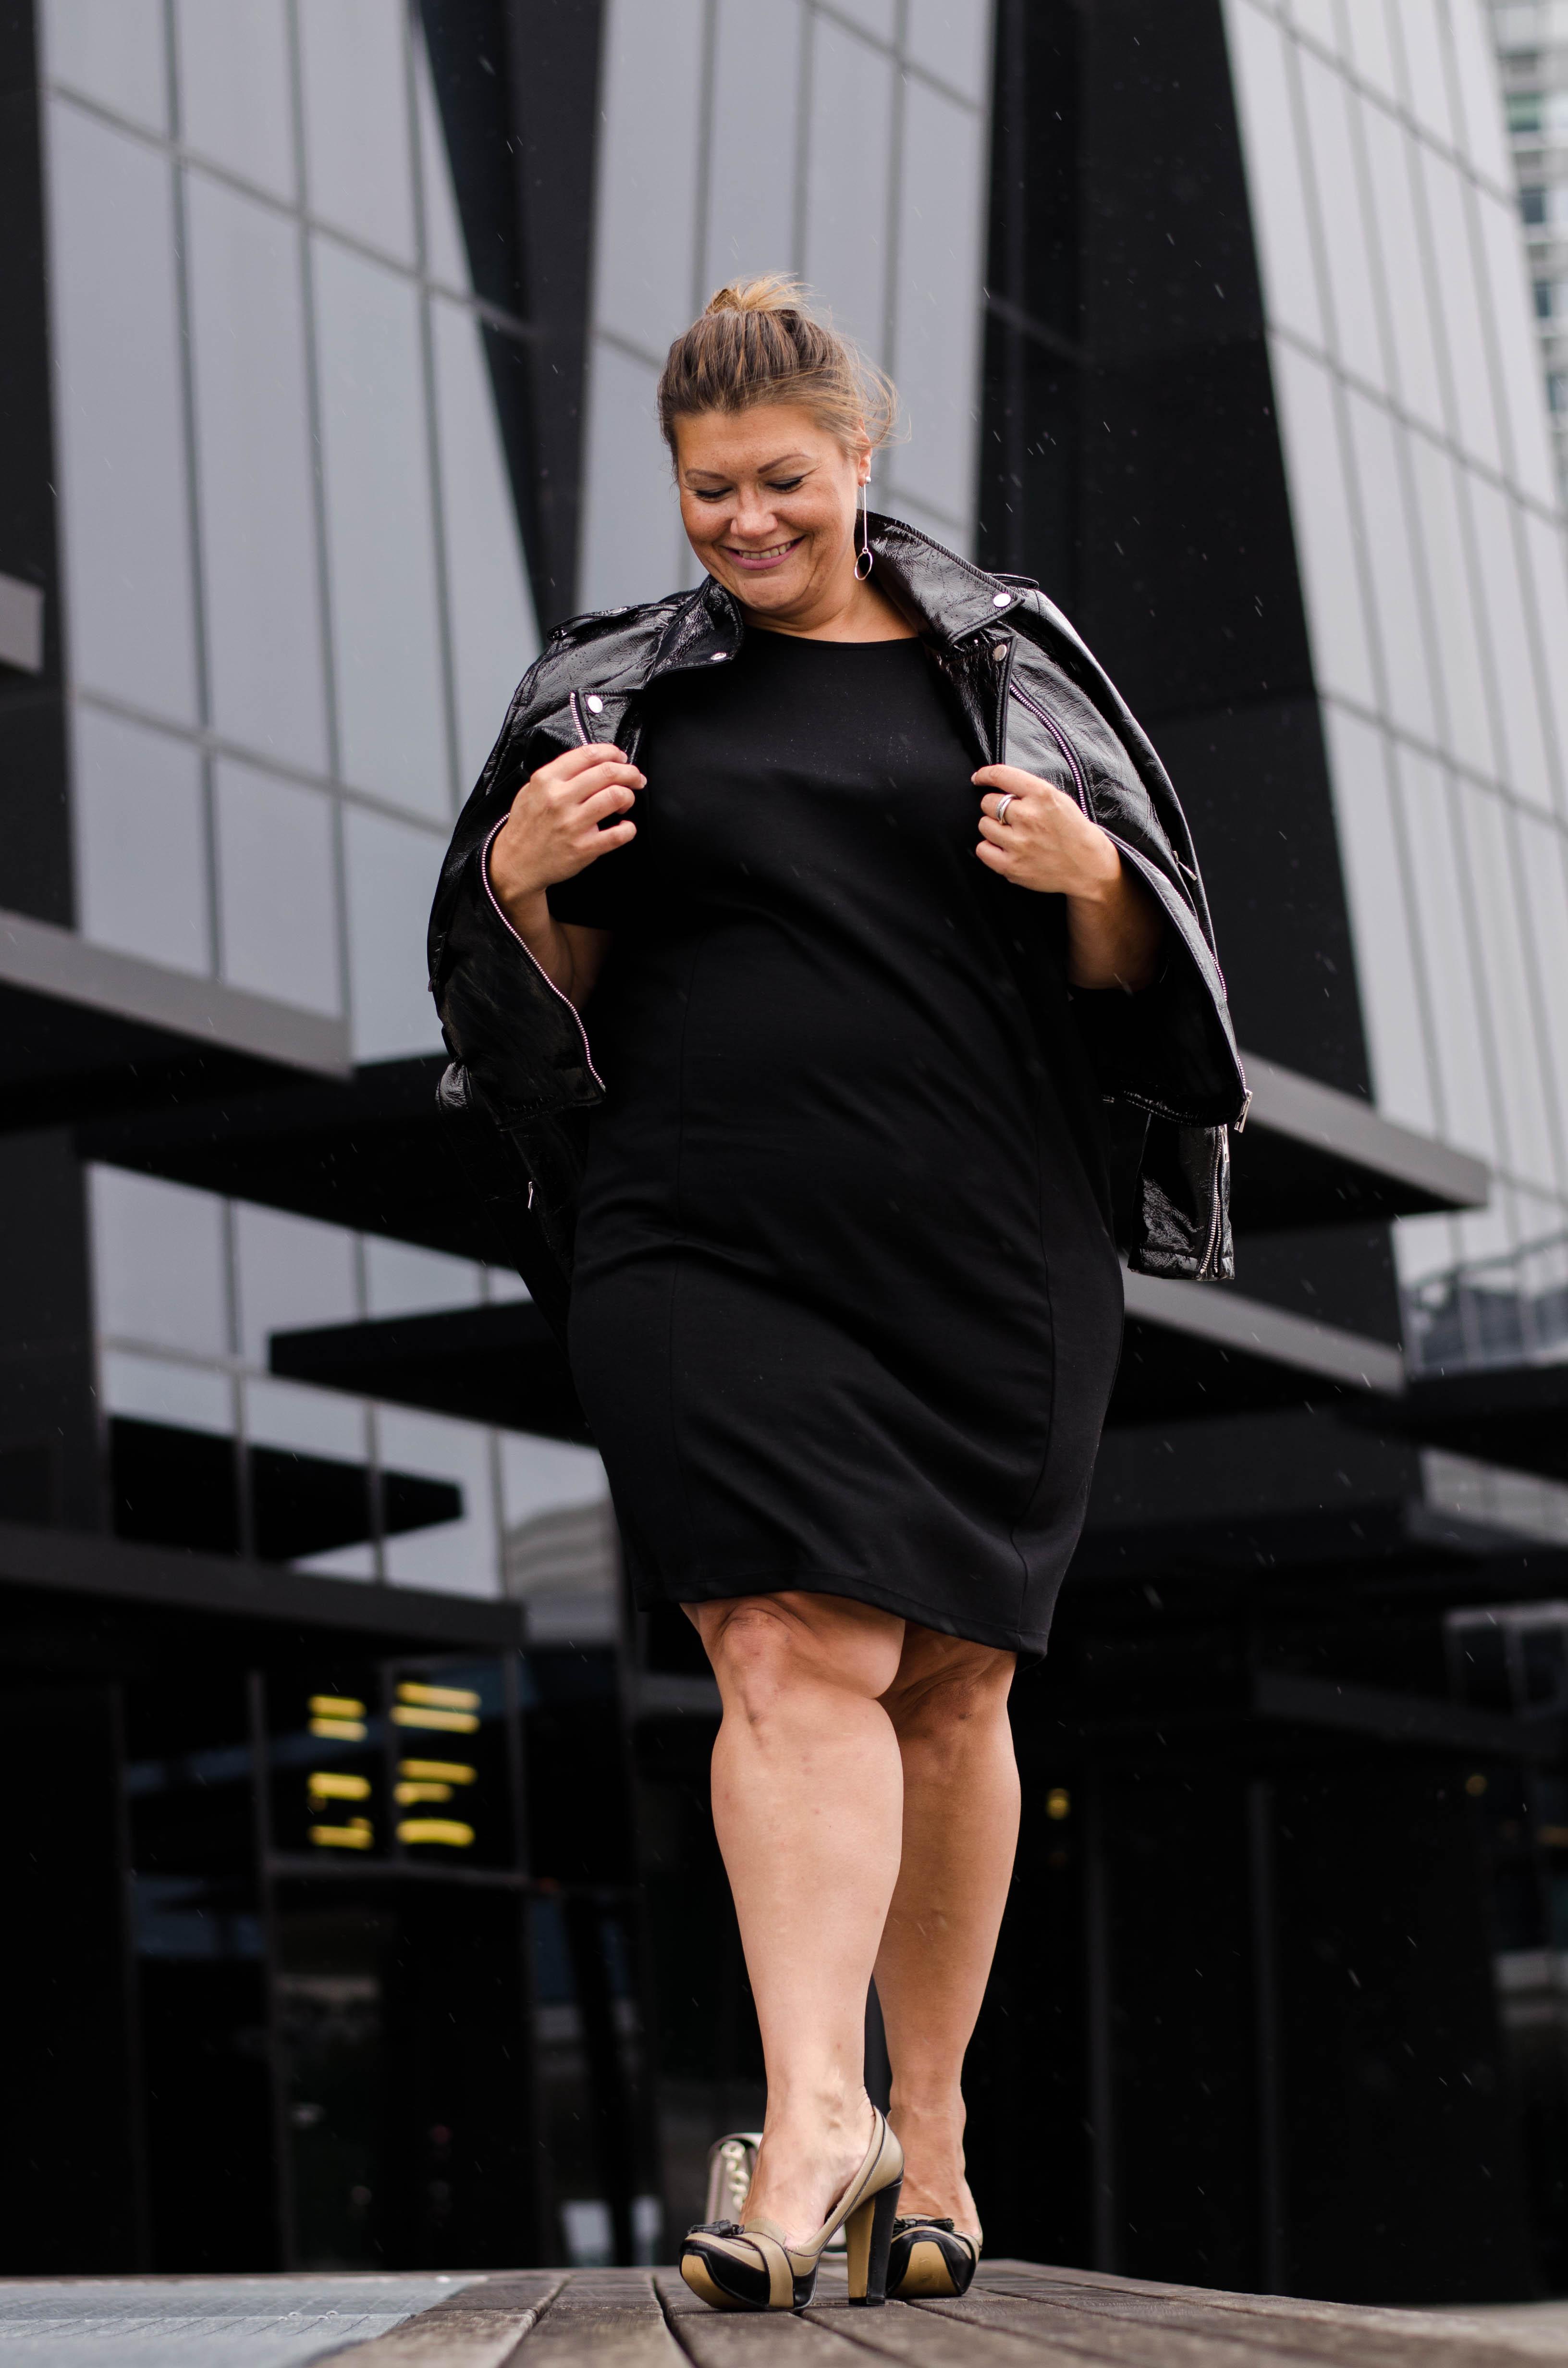 schwarzes kleid frapp fashion lack jacke zizzi fashion grandios vienna plus size fashion outfit look austrian blogger kardiaserena (4)